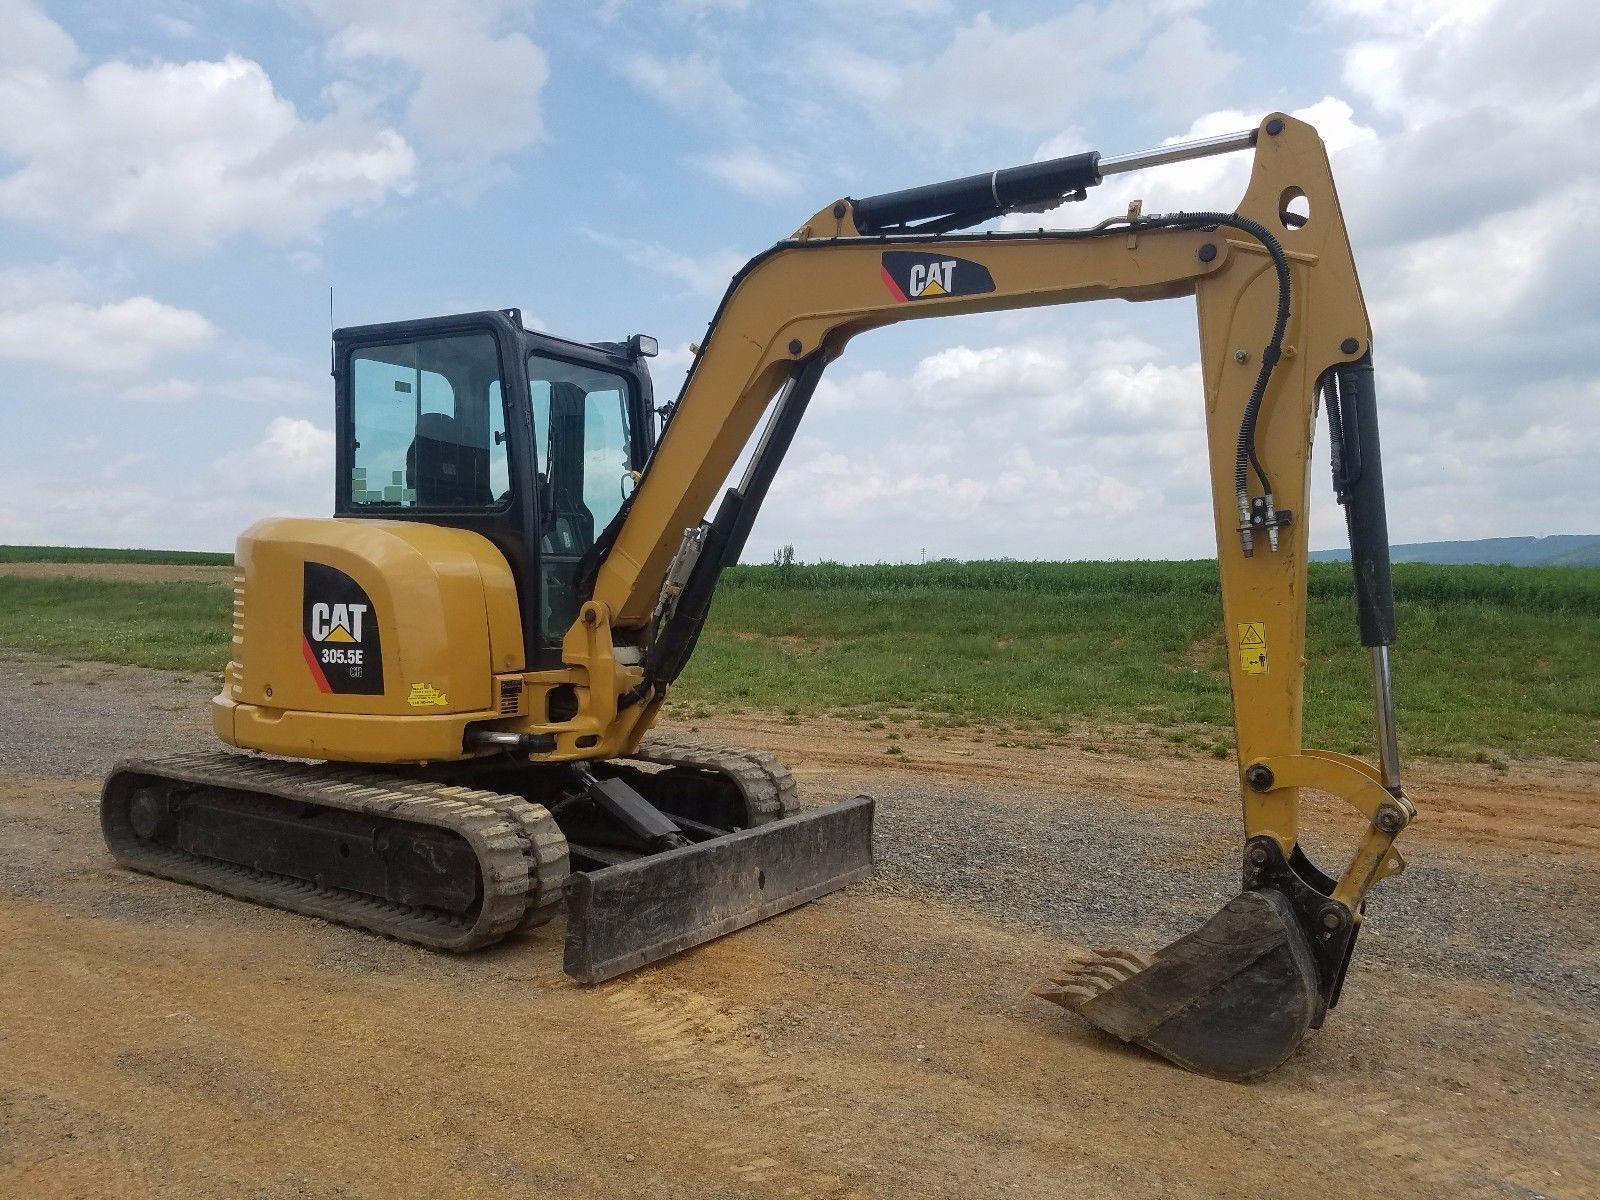 2012 Caterpillar 305.5E CR Mini Excavator Track Hoe